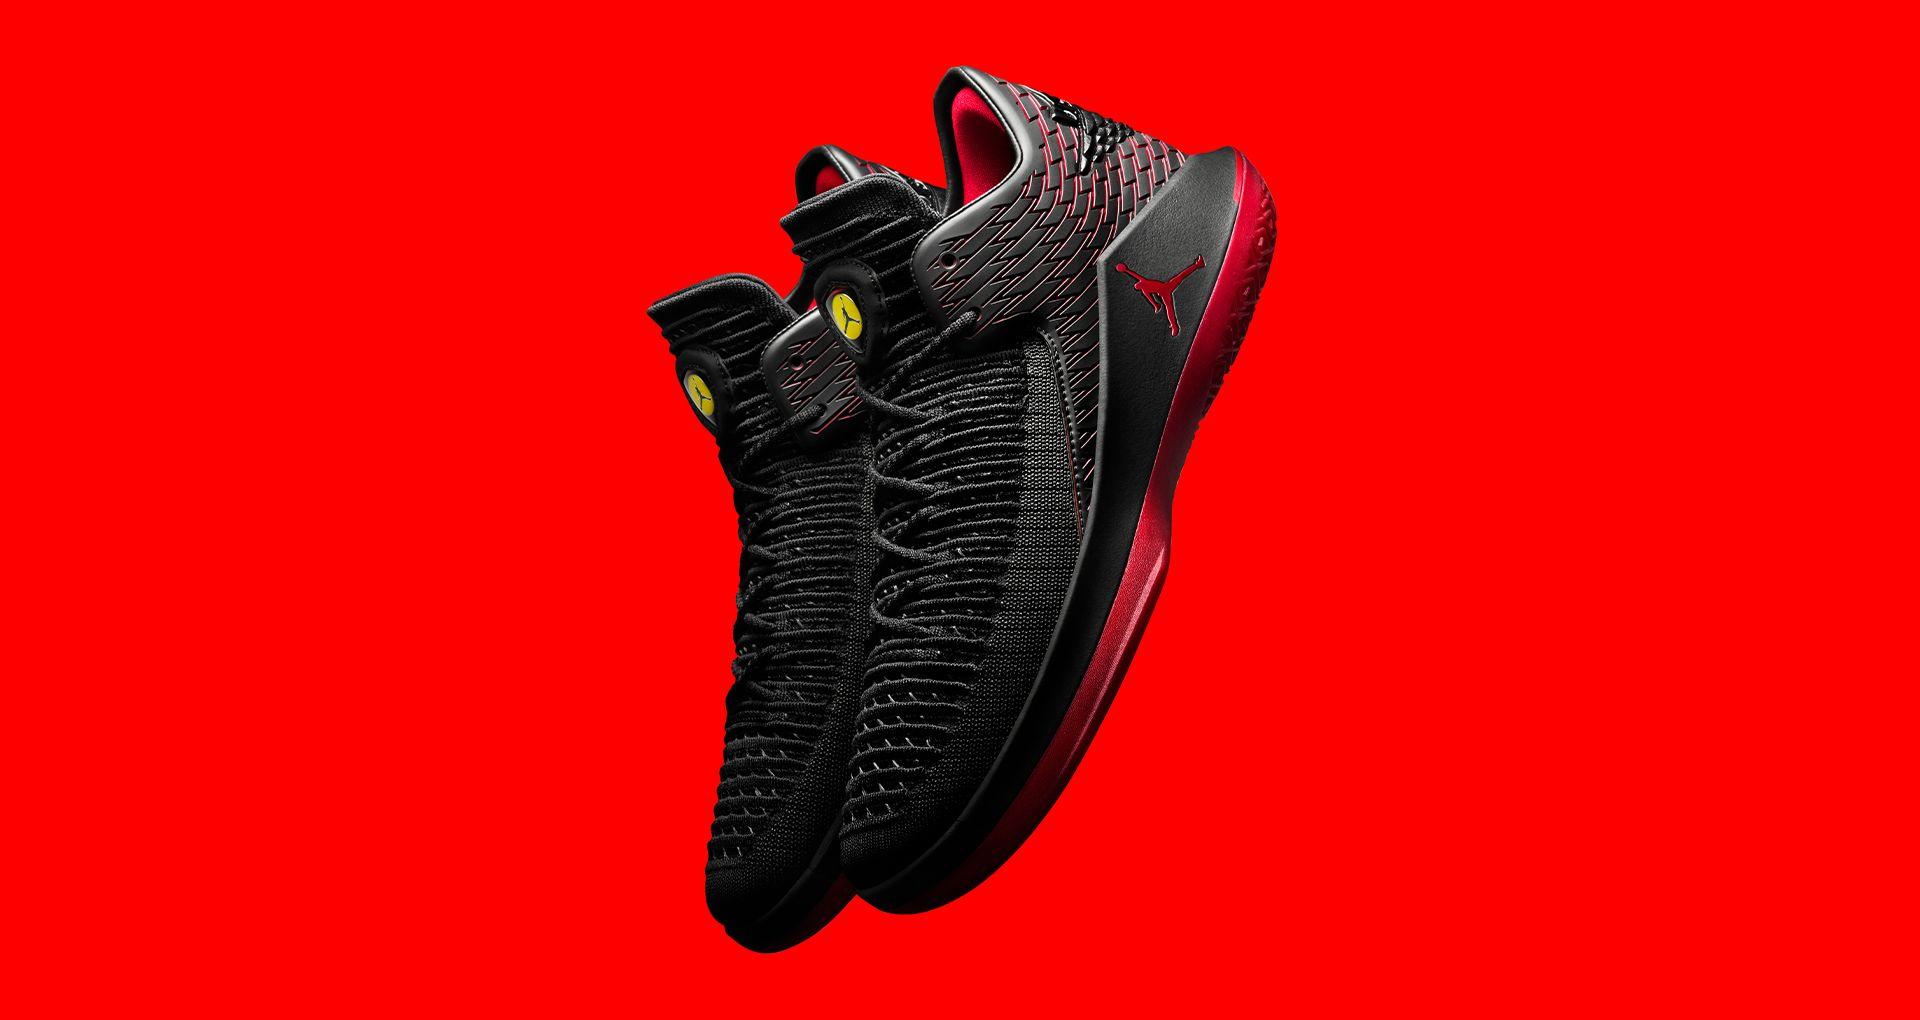 999f2800d9a8 Air Jordan 32 Low  Last Shot  Release Date. Nike+ SNKRS